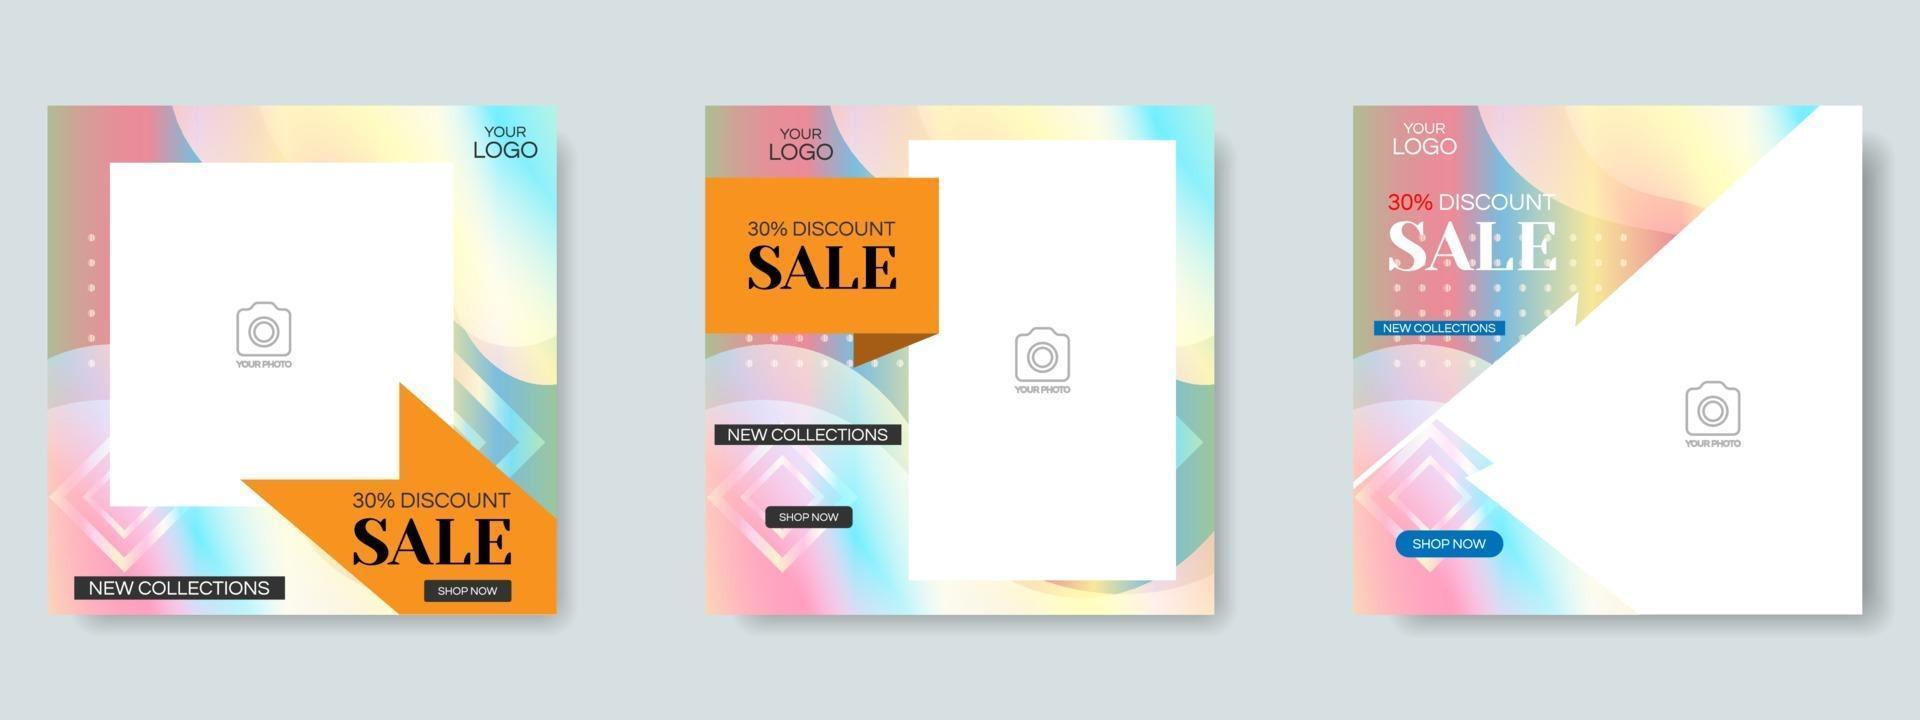 fashion sale social media post design template. web banner vector